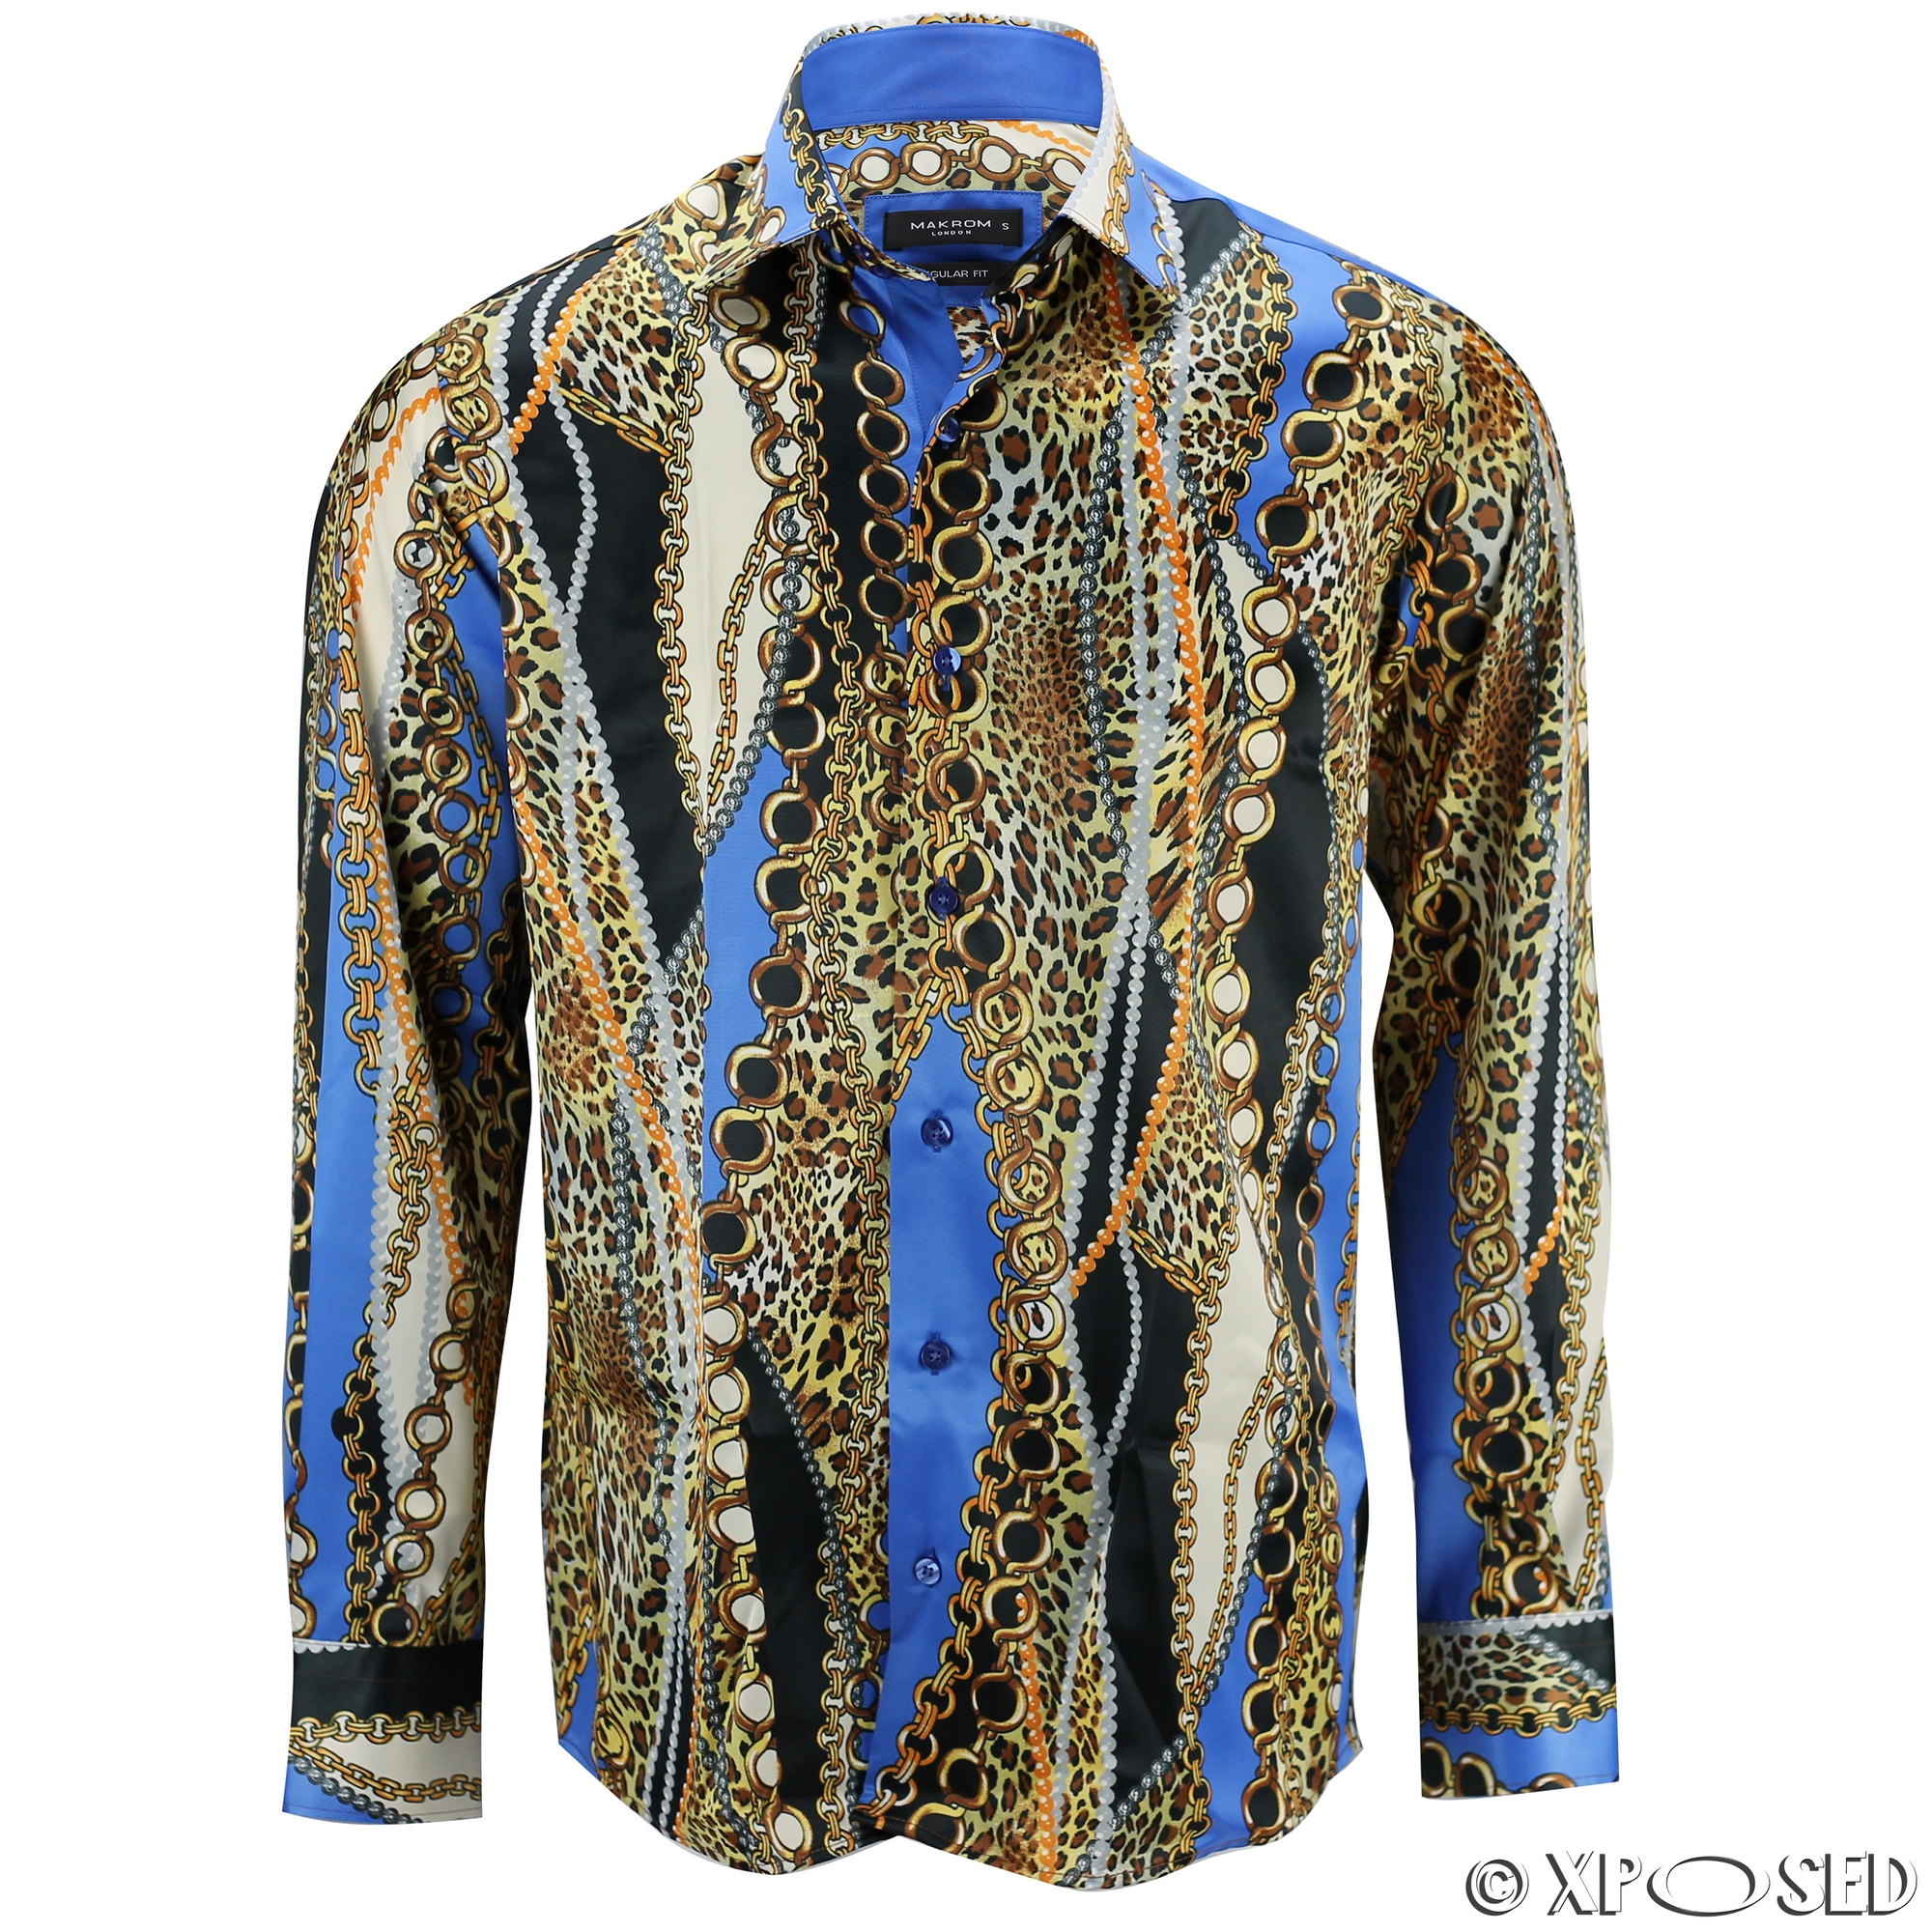 the gallery for gt italian designer shirts for men 2013